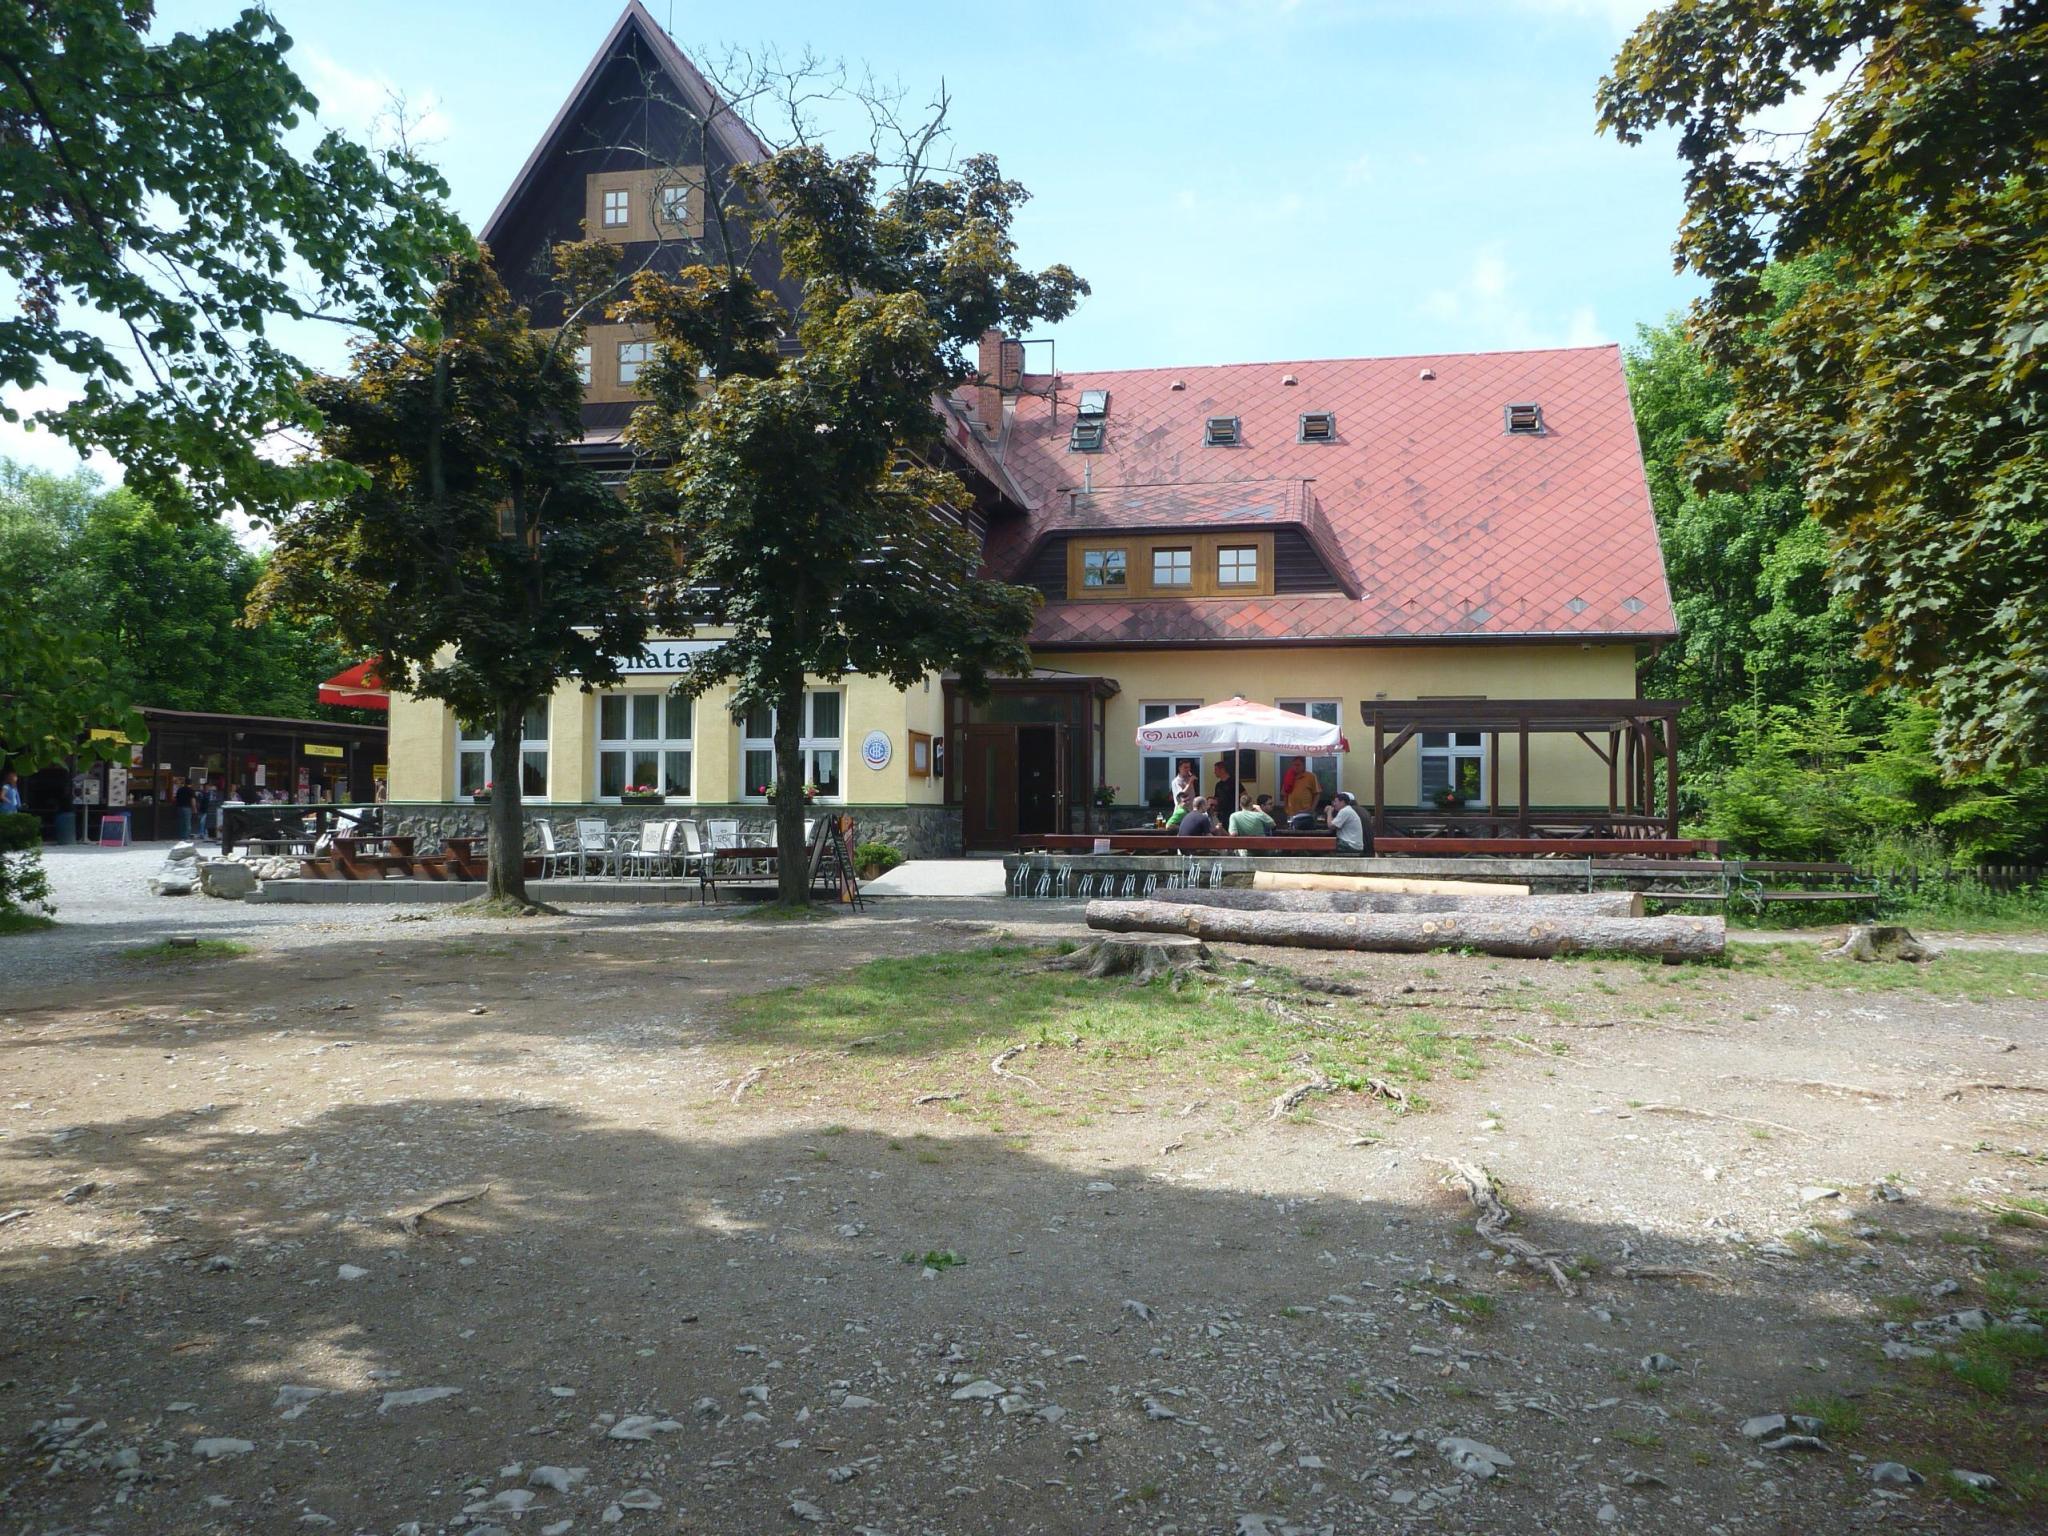 Macocha turistaház (Fotó: Buda Csaba)